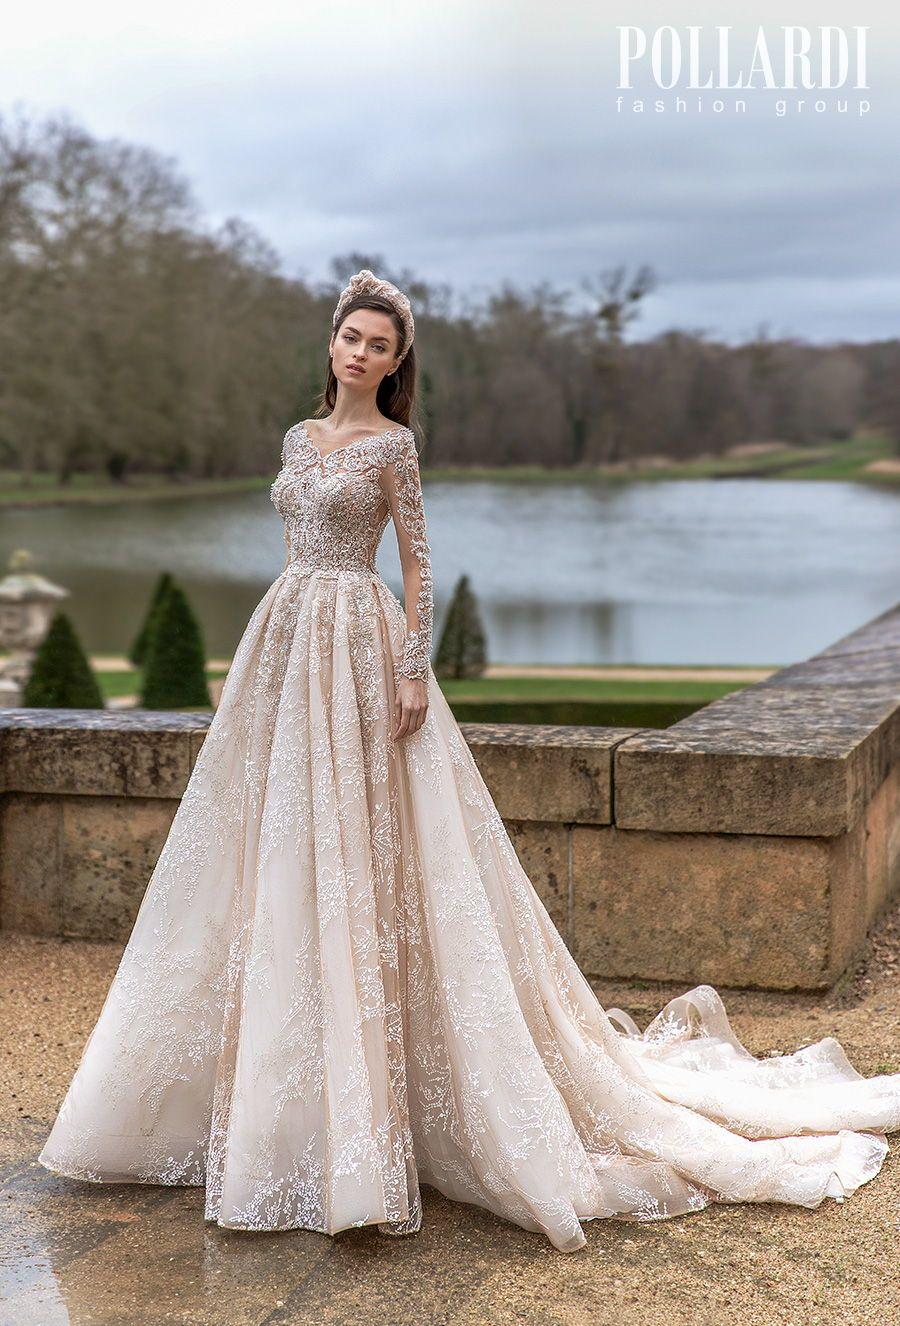 Pollardi Wedding Dresses | Wedding Inspirasi  -- pollardi 2021 royalty bridal long sleeves v neck heavily embellished bodice glamorous princess ivory a  line